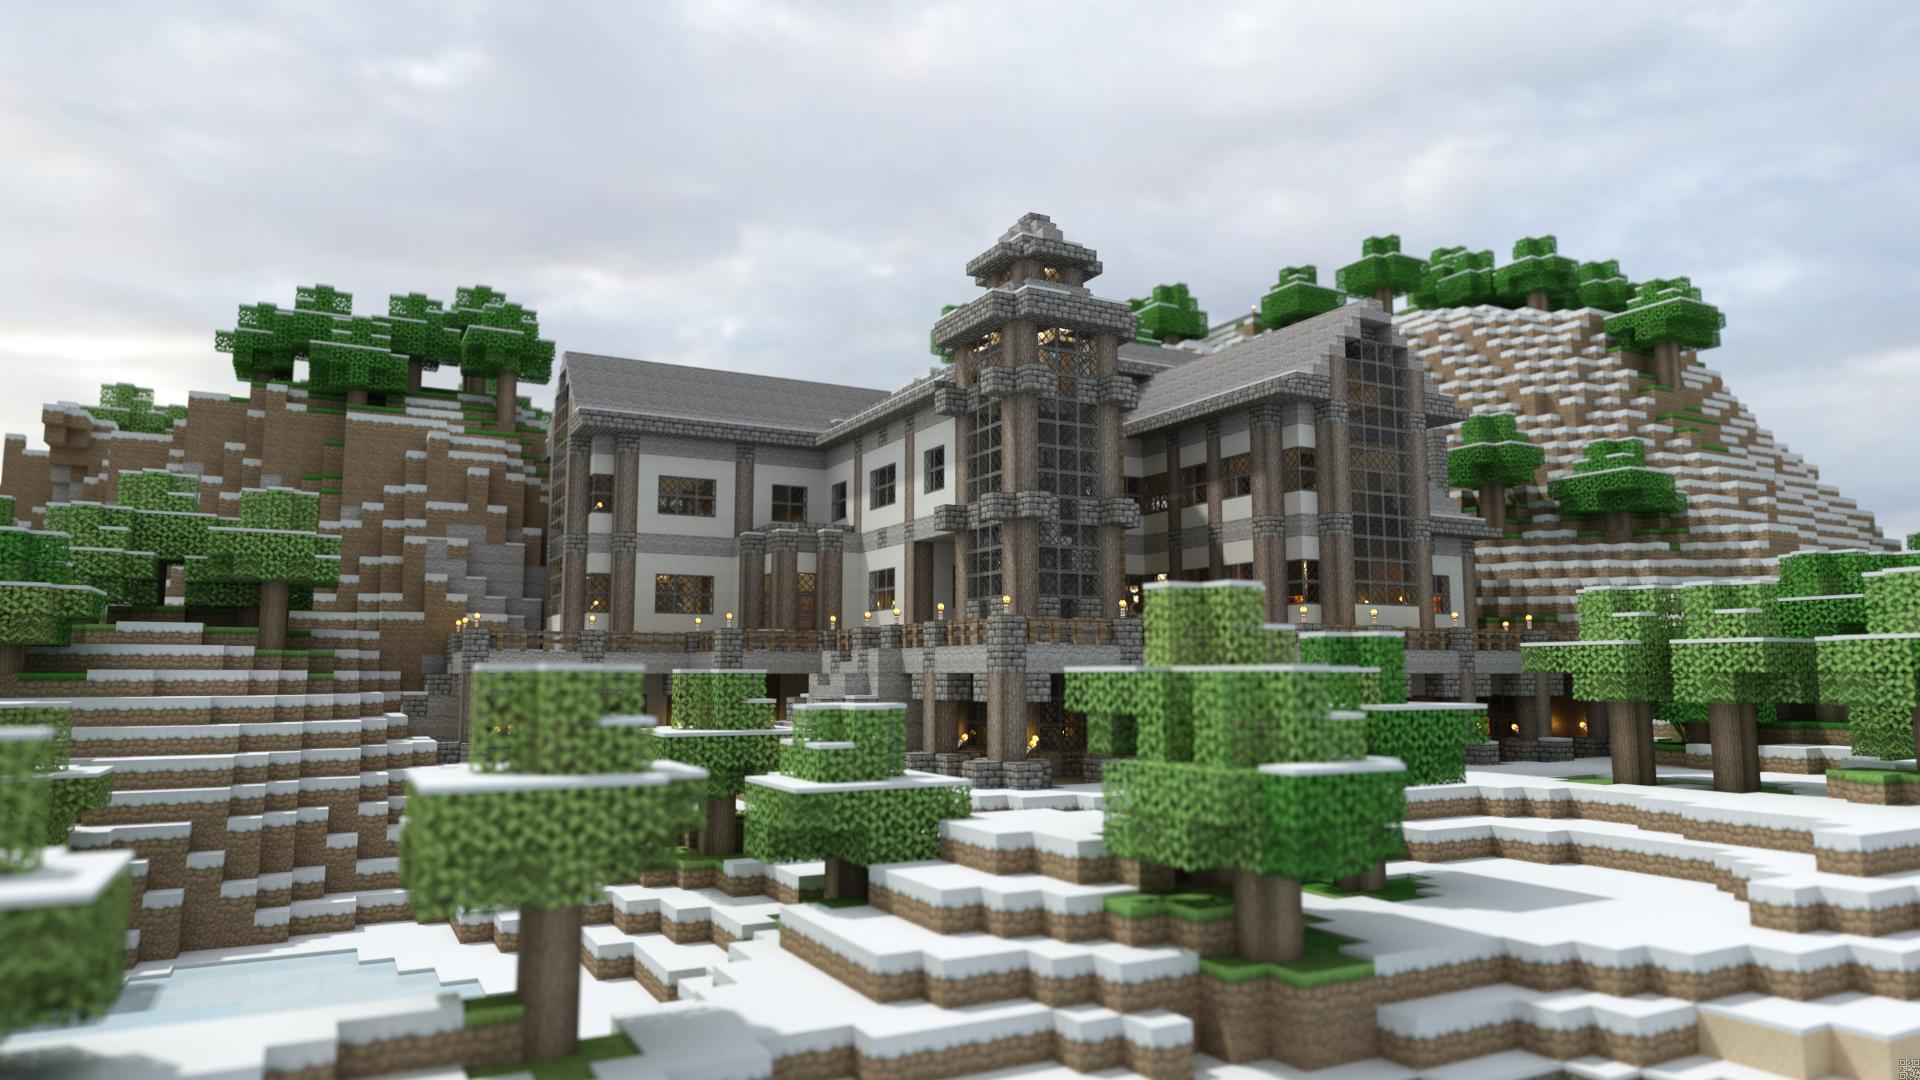 Maison Minecraft Moderne – Ventana Blog